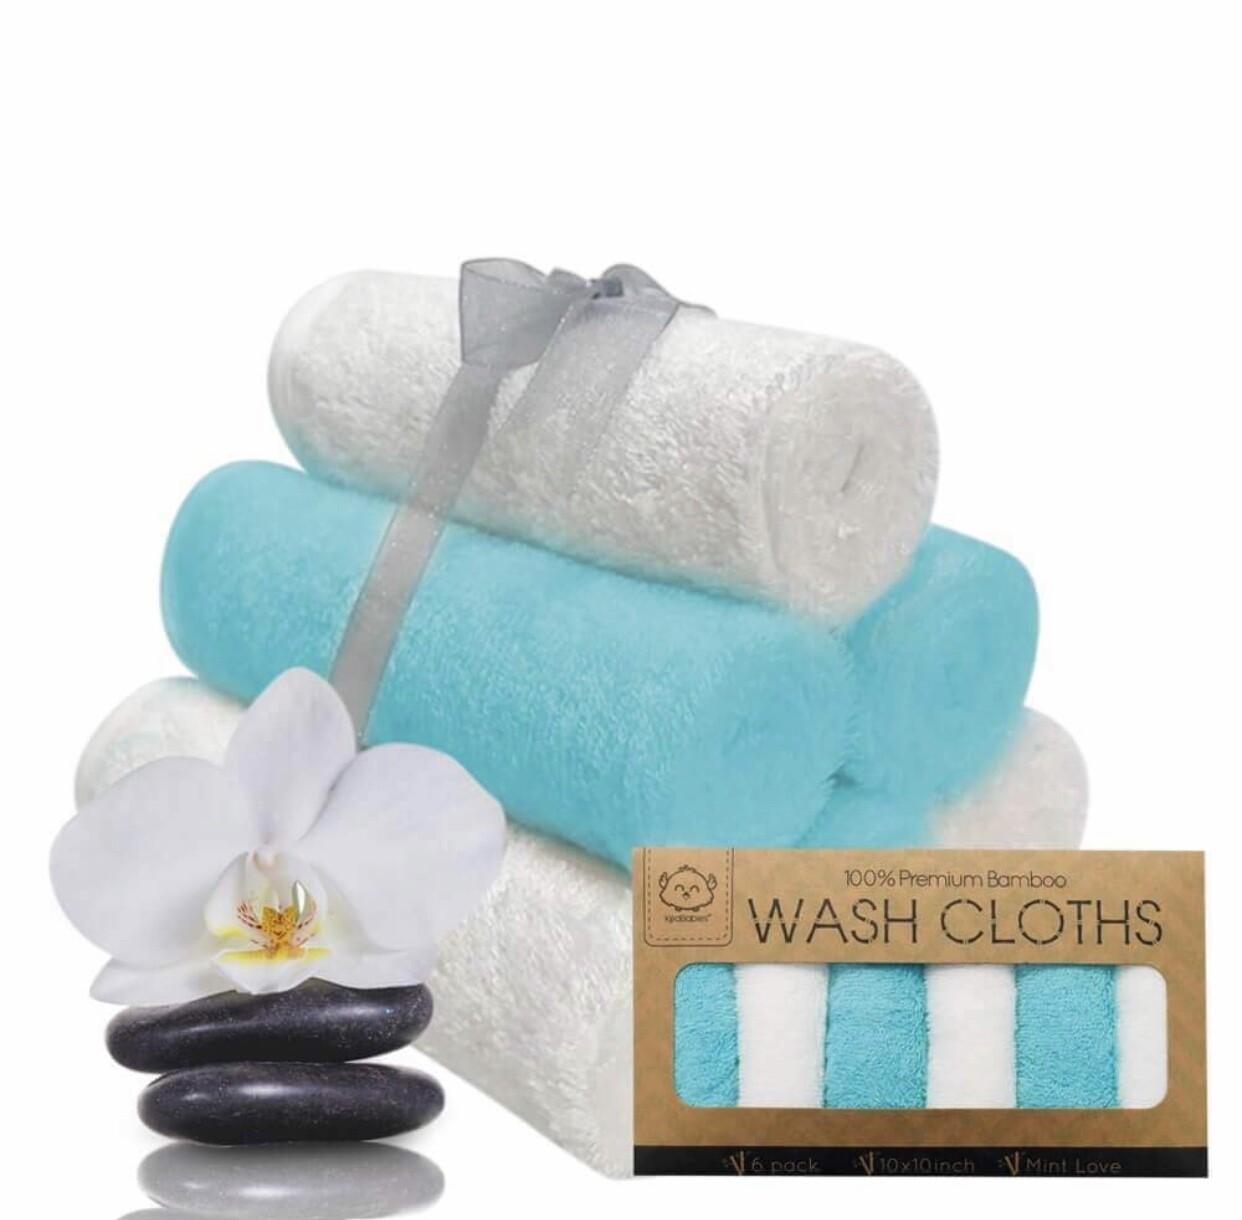 Wash Cloths Mint Love, Organic Bamboo